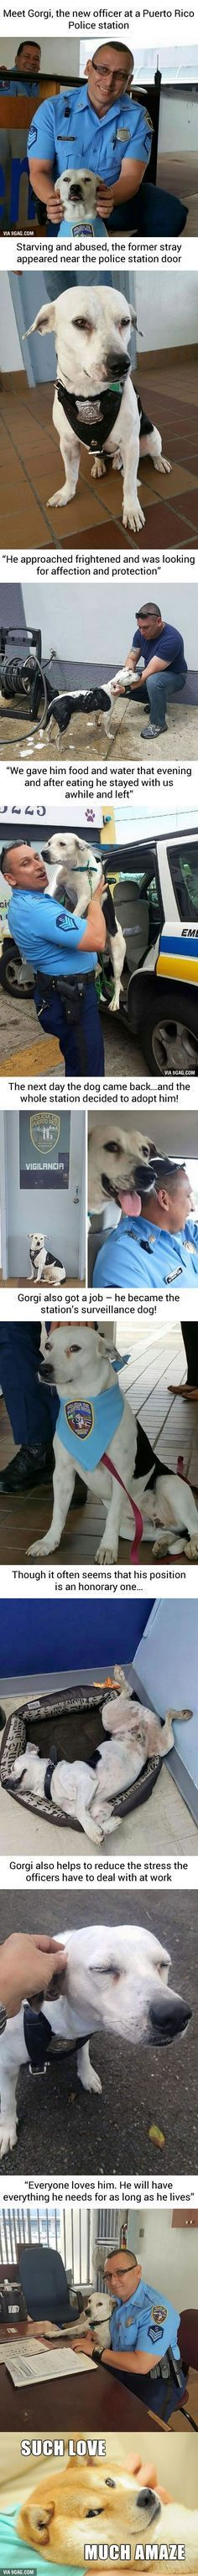 Stray Dog Walks Into Police Station Gets A Job 9GAG Dog Food Recipes